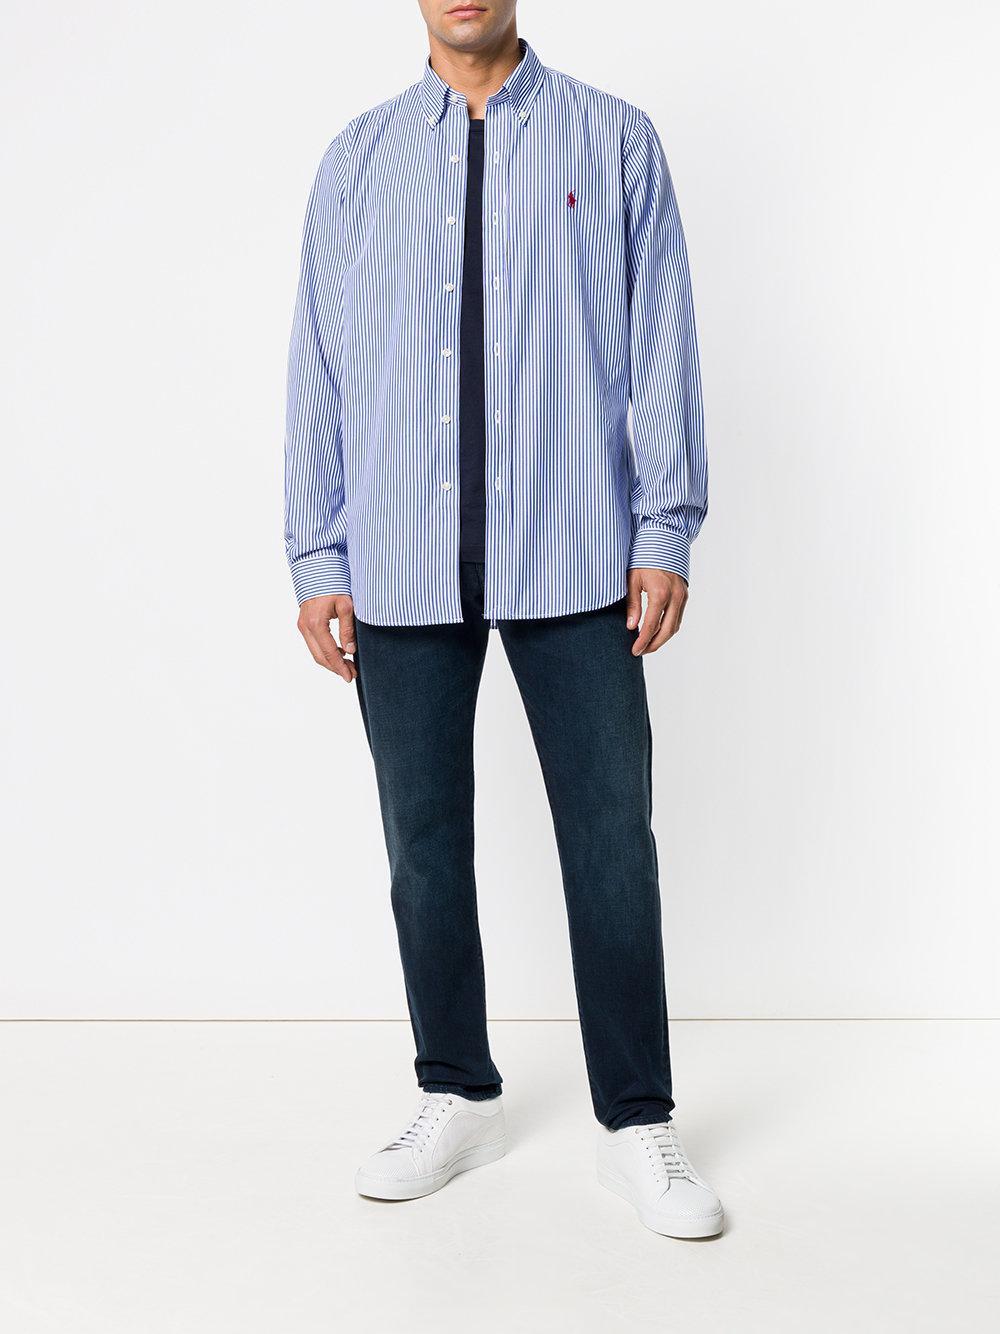 4e645836b3 Lyst - Polo Ralph Lauren Button-down Striped Shirt in Blue for Men - Save  15%